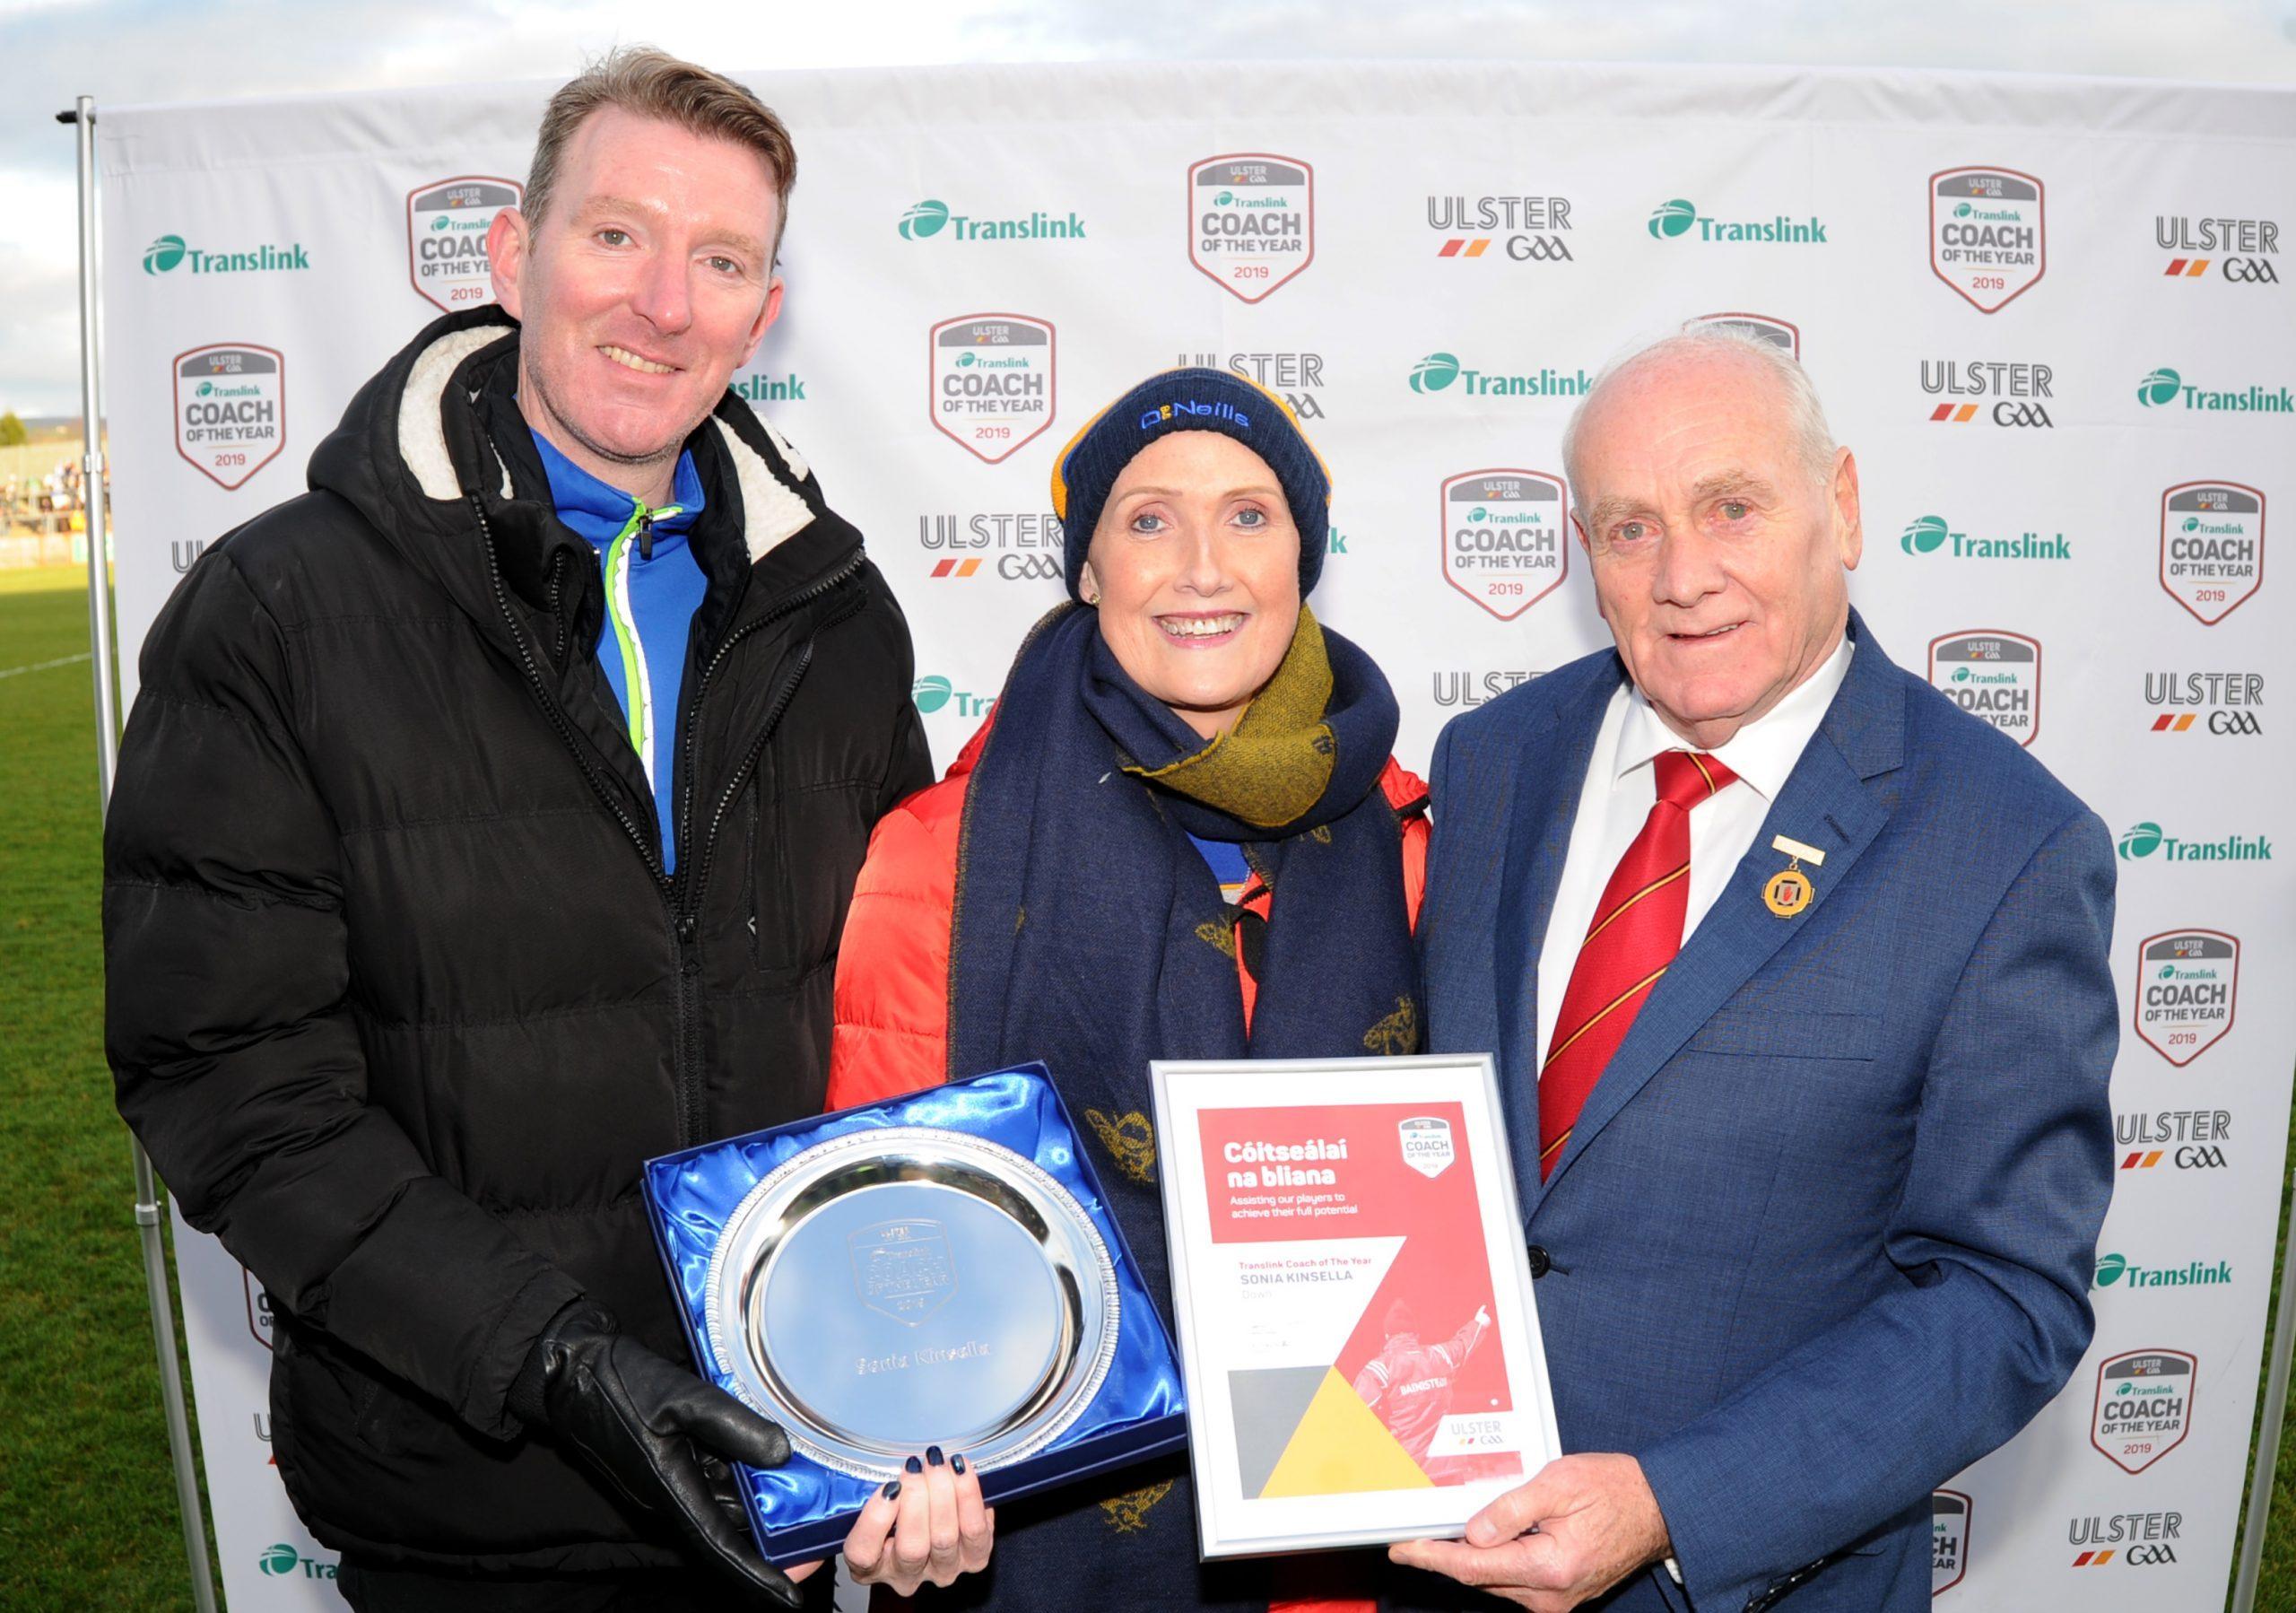 Saul clubwoman wins Translink Ulster GAA Coach of the Year award